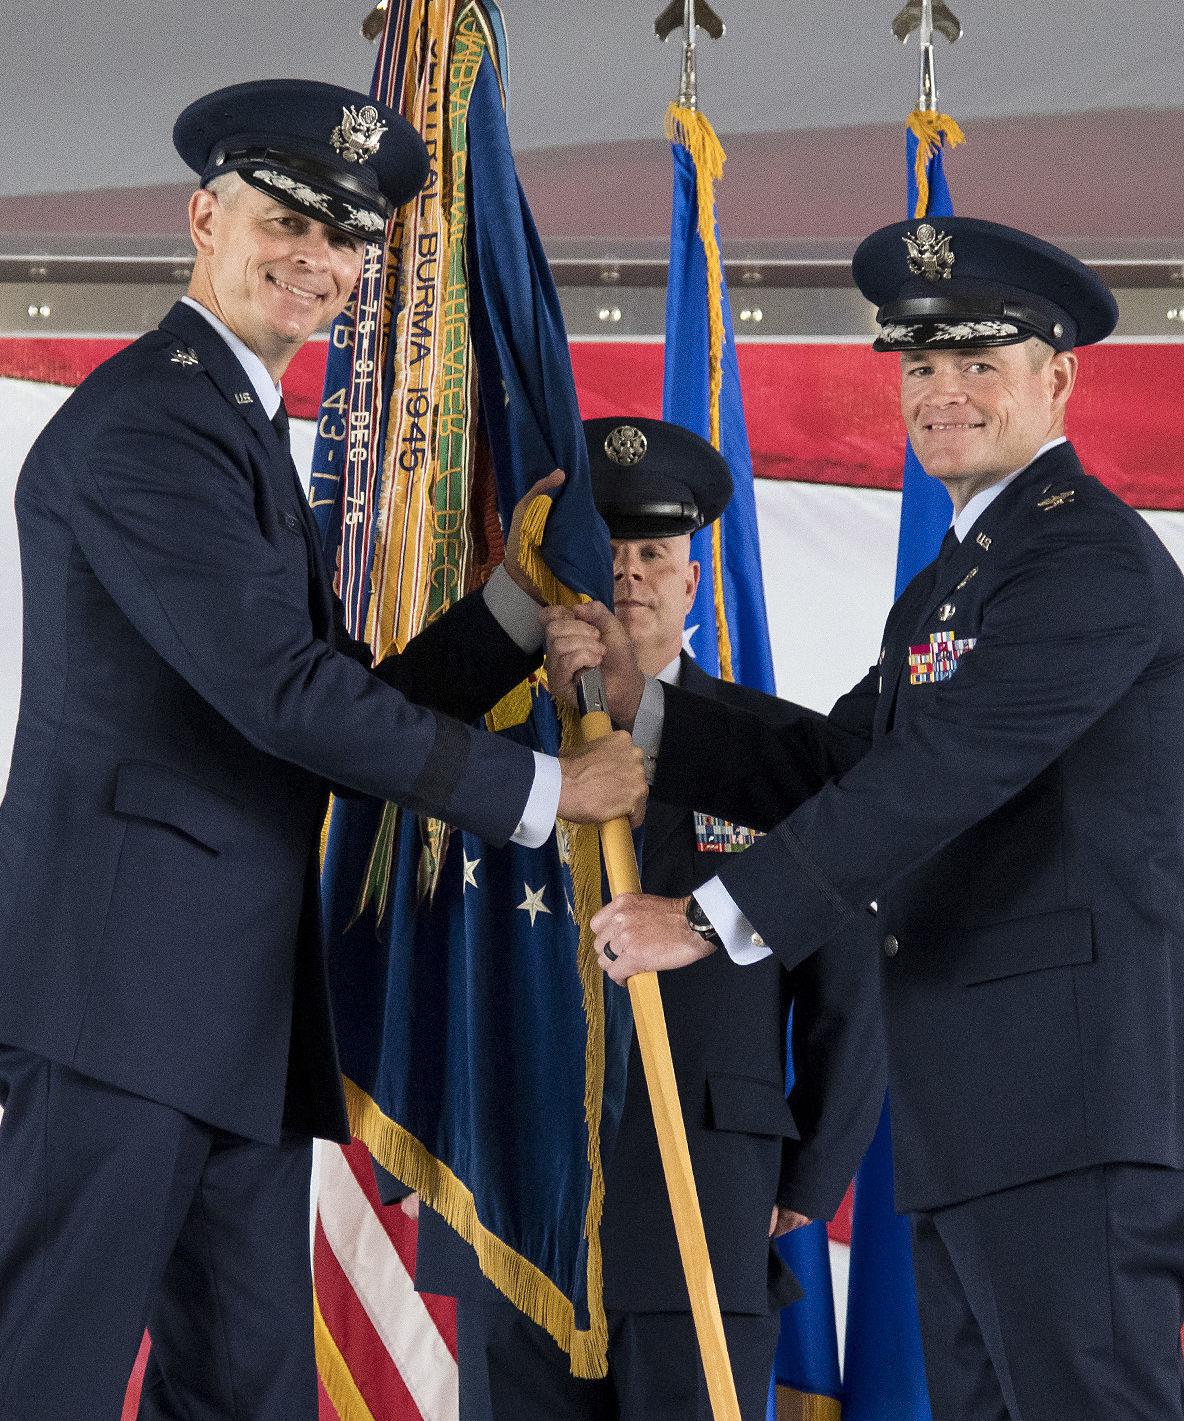 mcj-2020-08-05-news-scott-rowe-commander